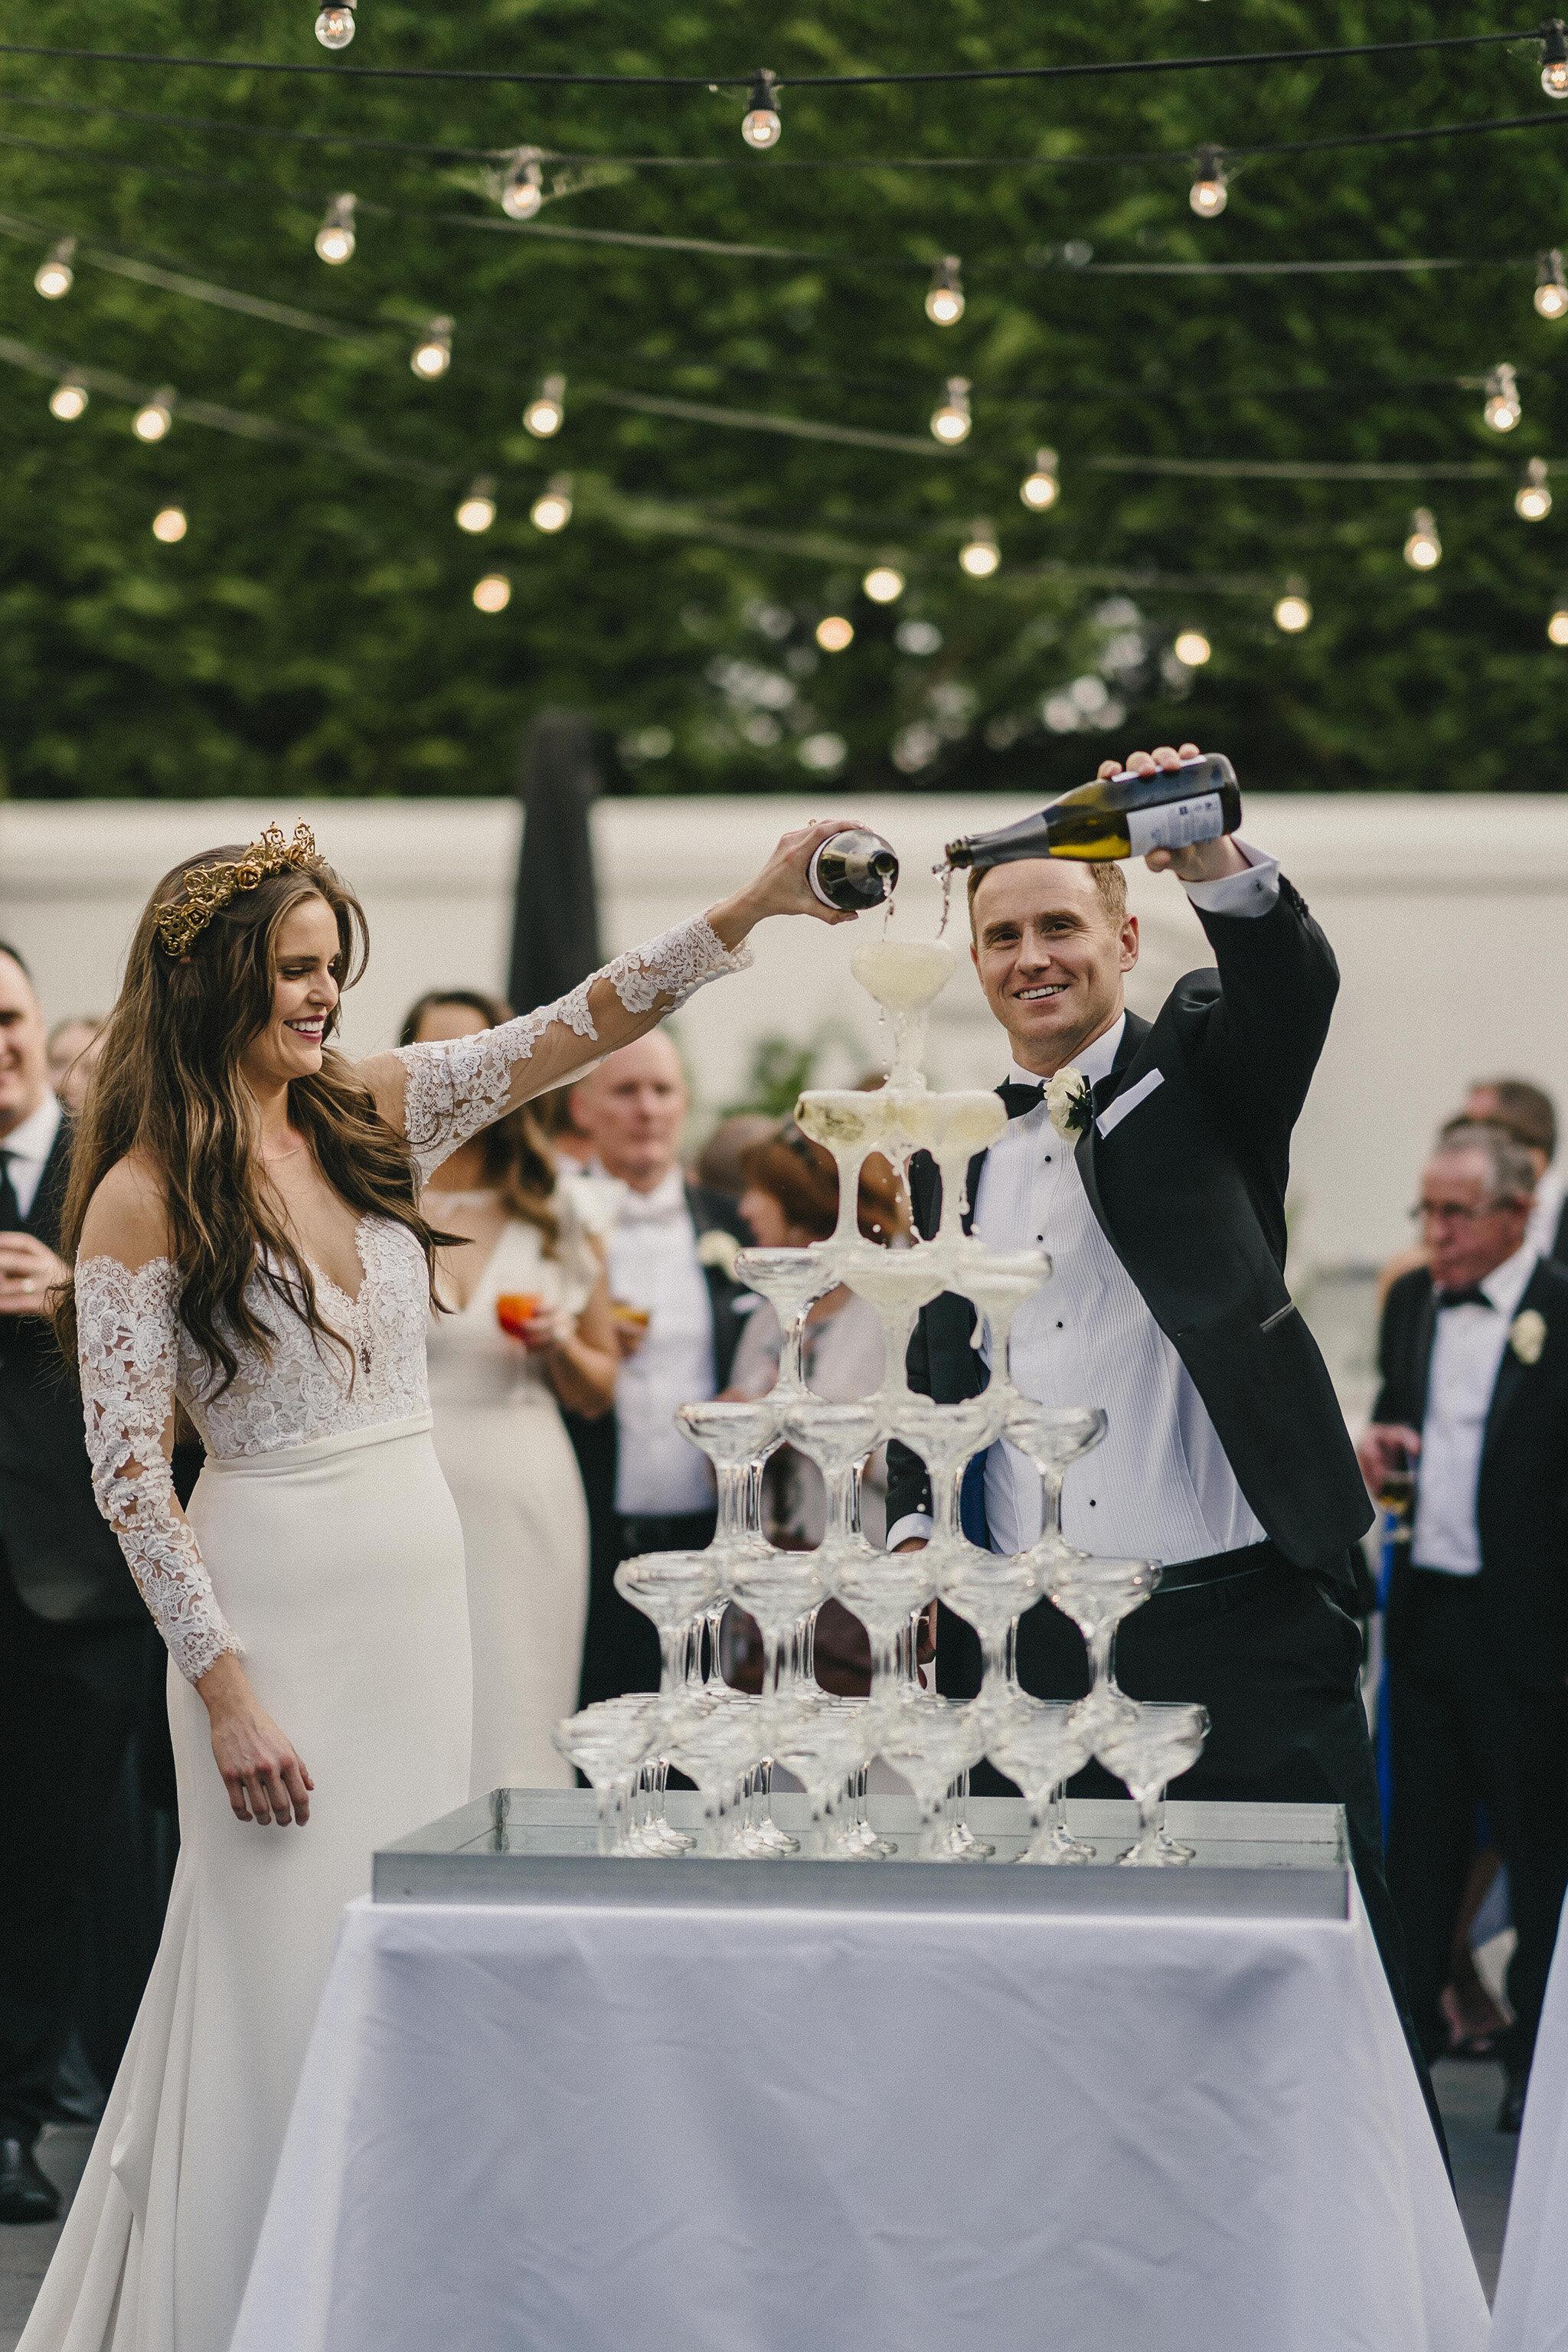 Quat Quatta Melbourne Wedding Photography_003.jpg